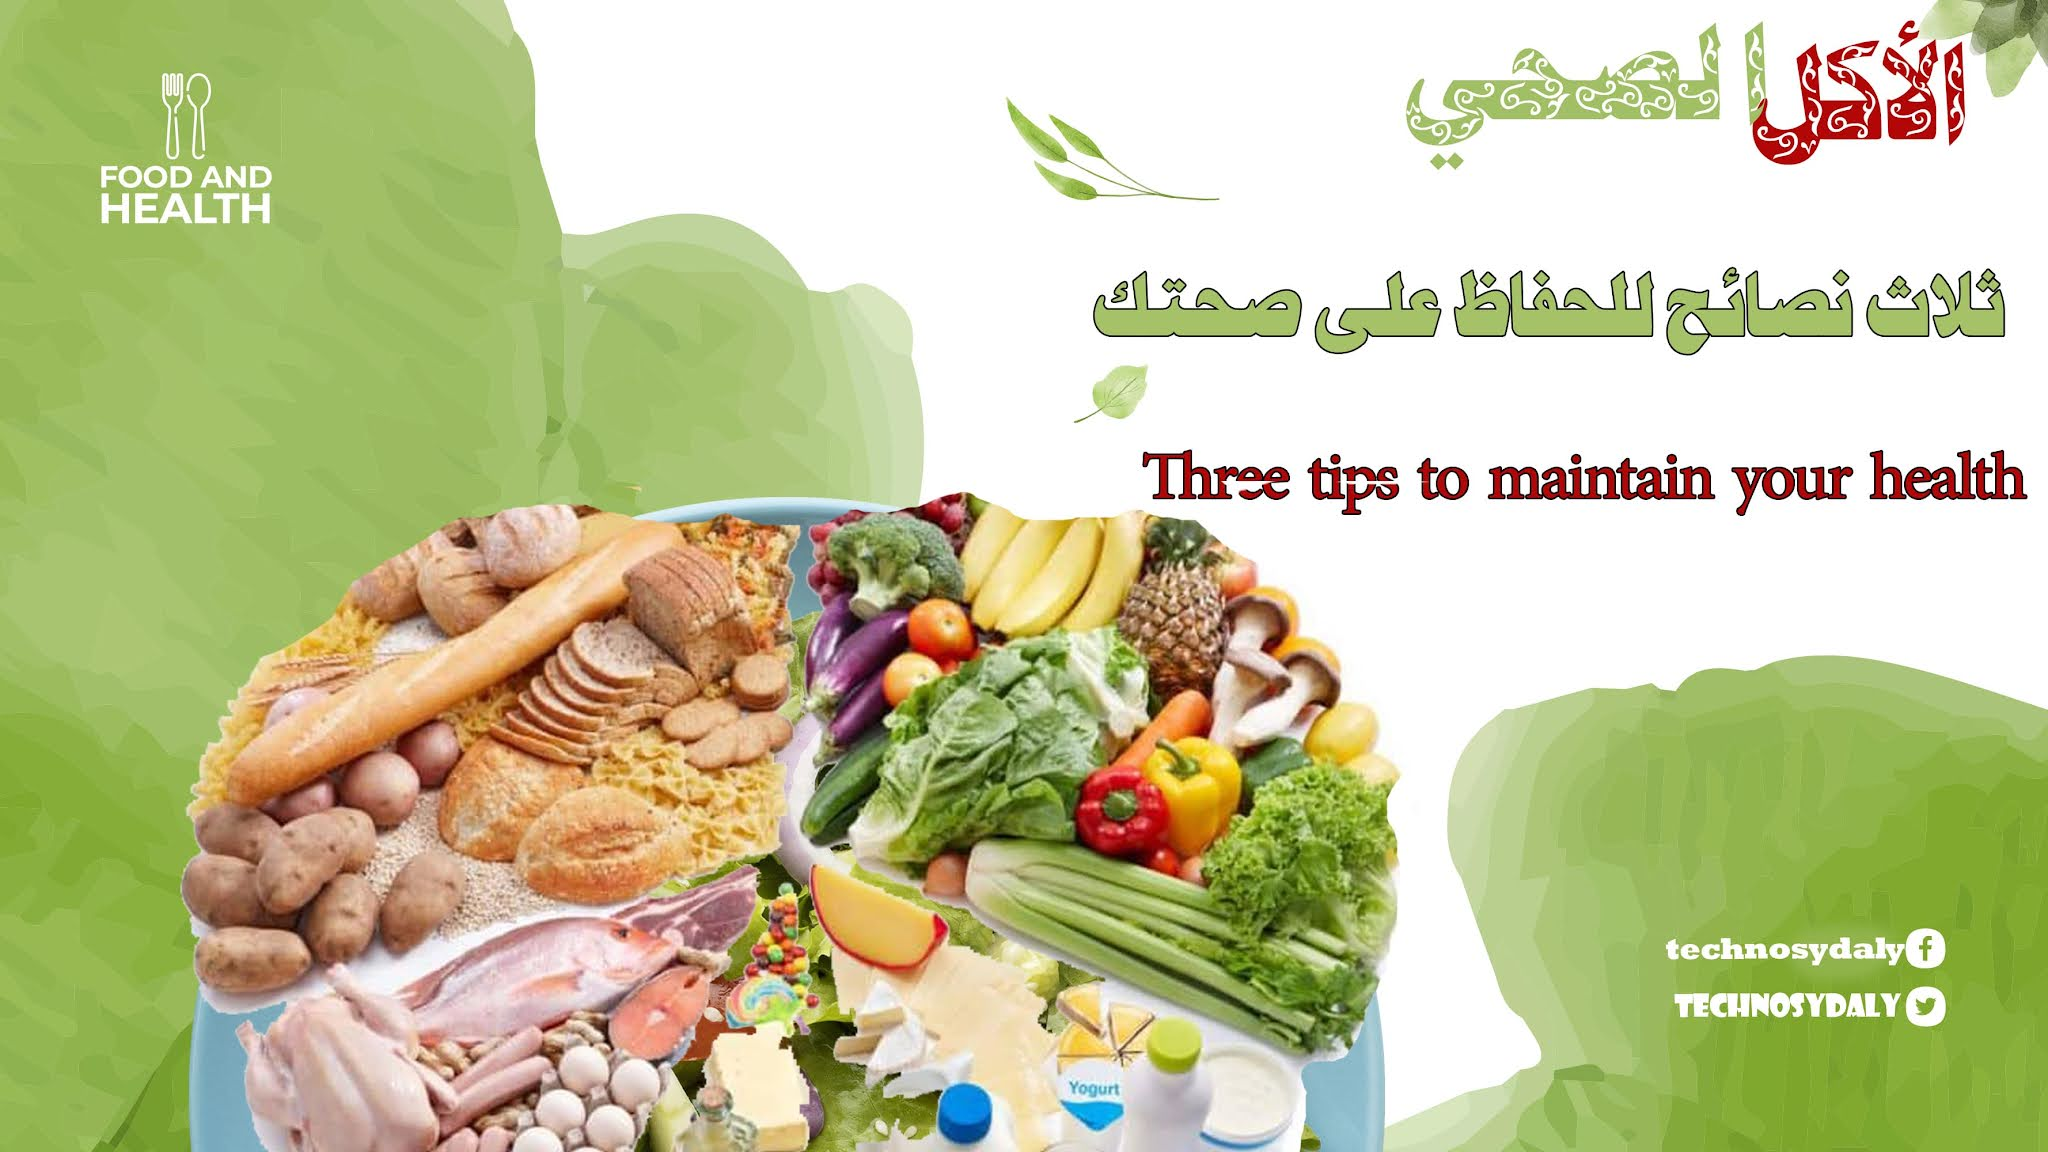 ثلاث نصائح للحفاظ على صحتك Three tips to maintain your health